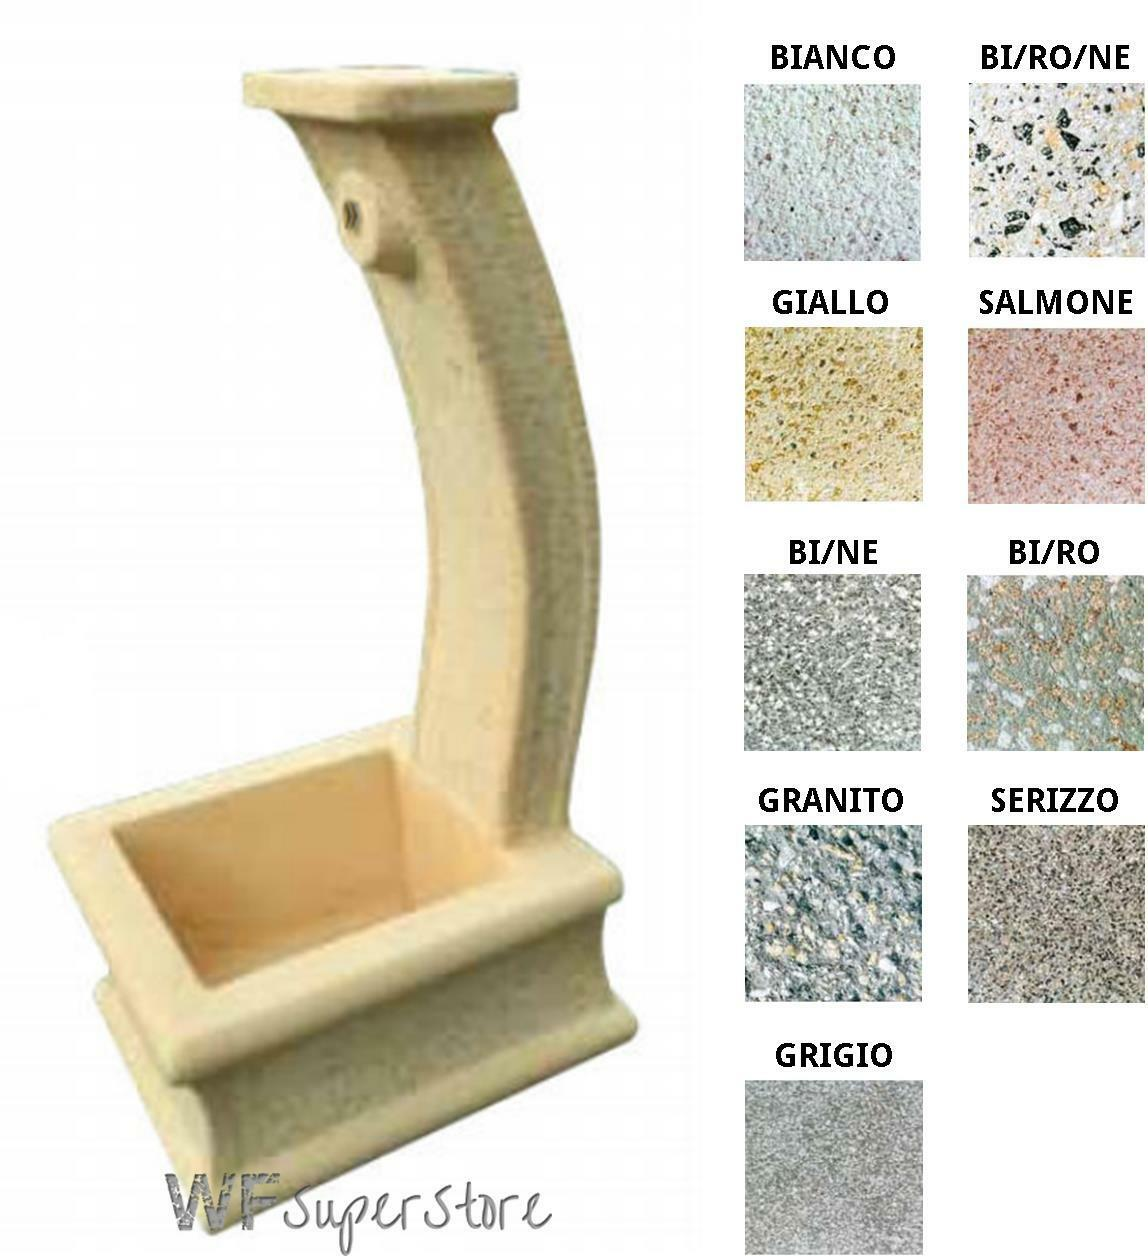 Fontana in pietra ricostruita Milù - fontanella esterno giardino